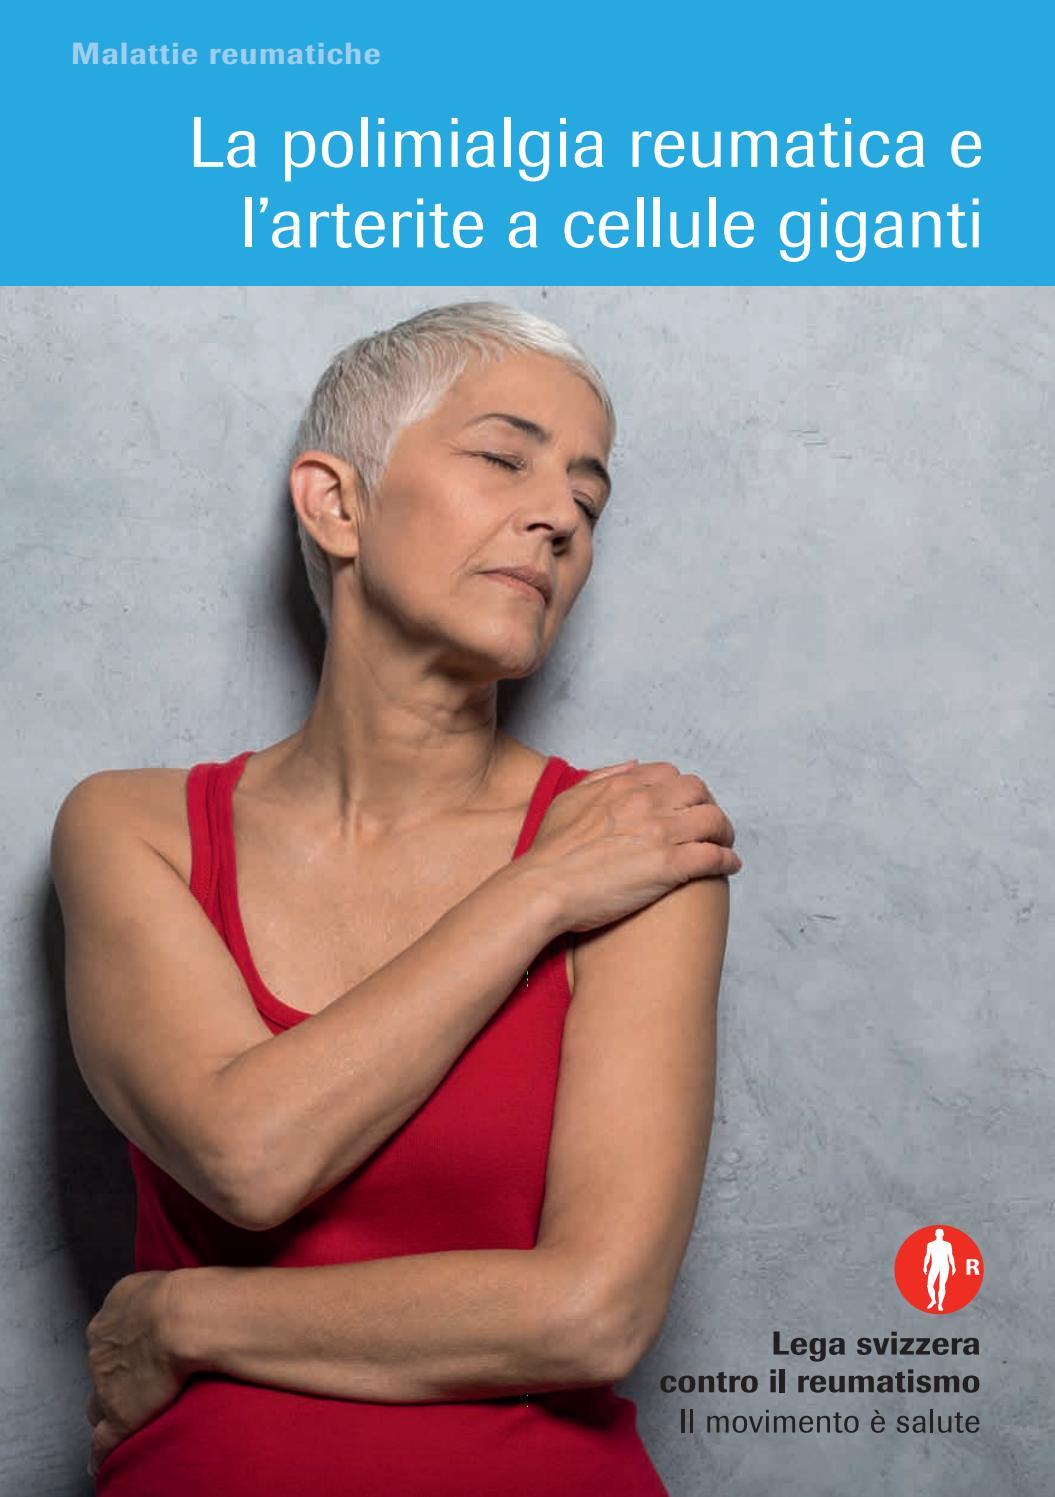 Artropatie infiammatorie nell'anziano